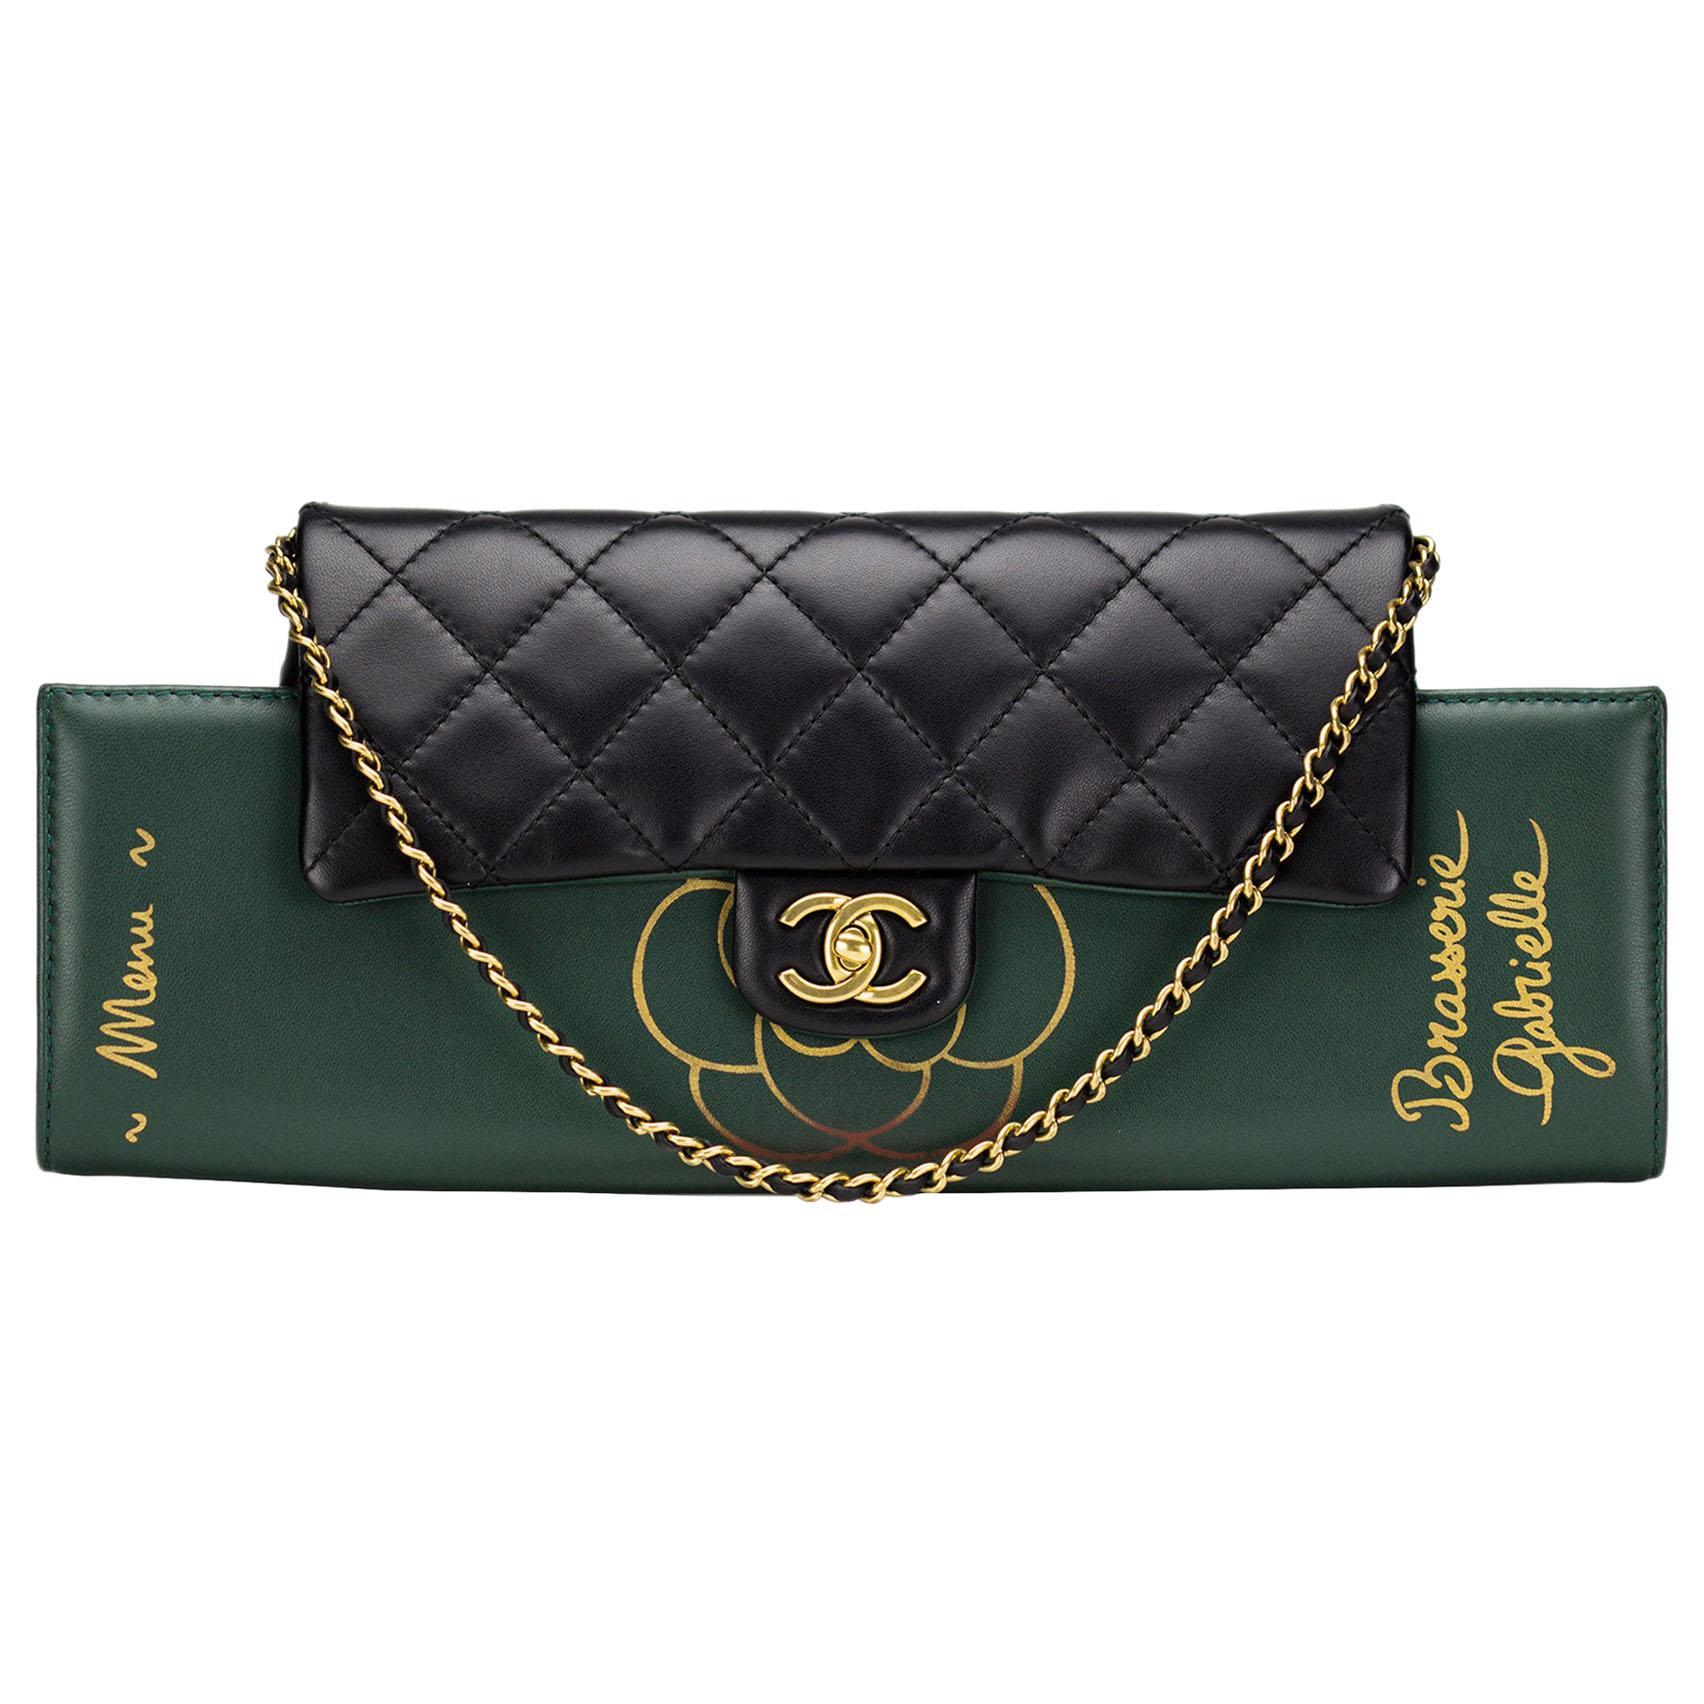 Chanel Runway Brasserie Calfskin Gabrielle Shoulder Flap Bag and Clutch, 2015